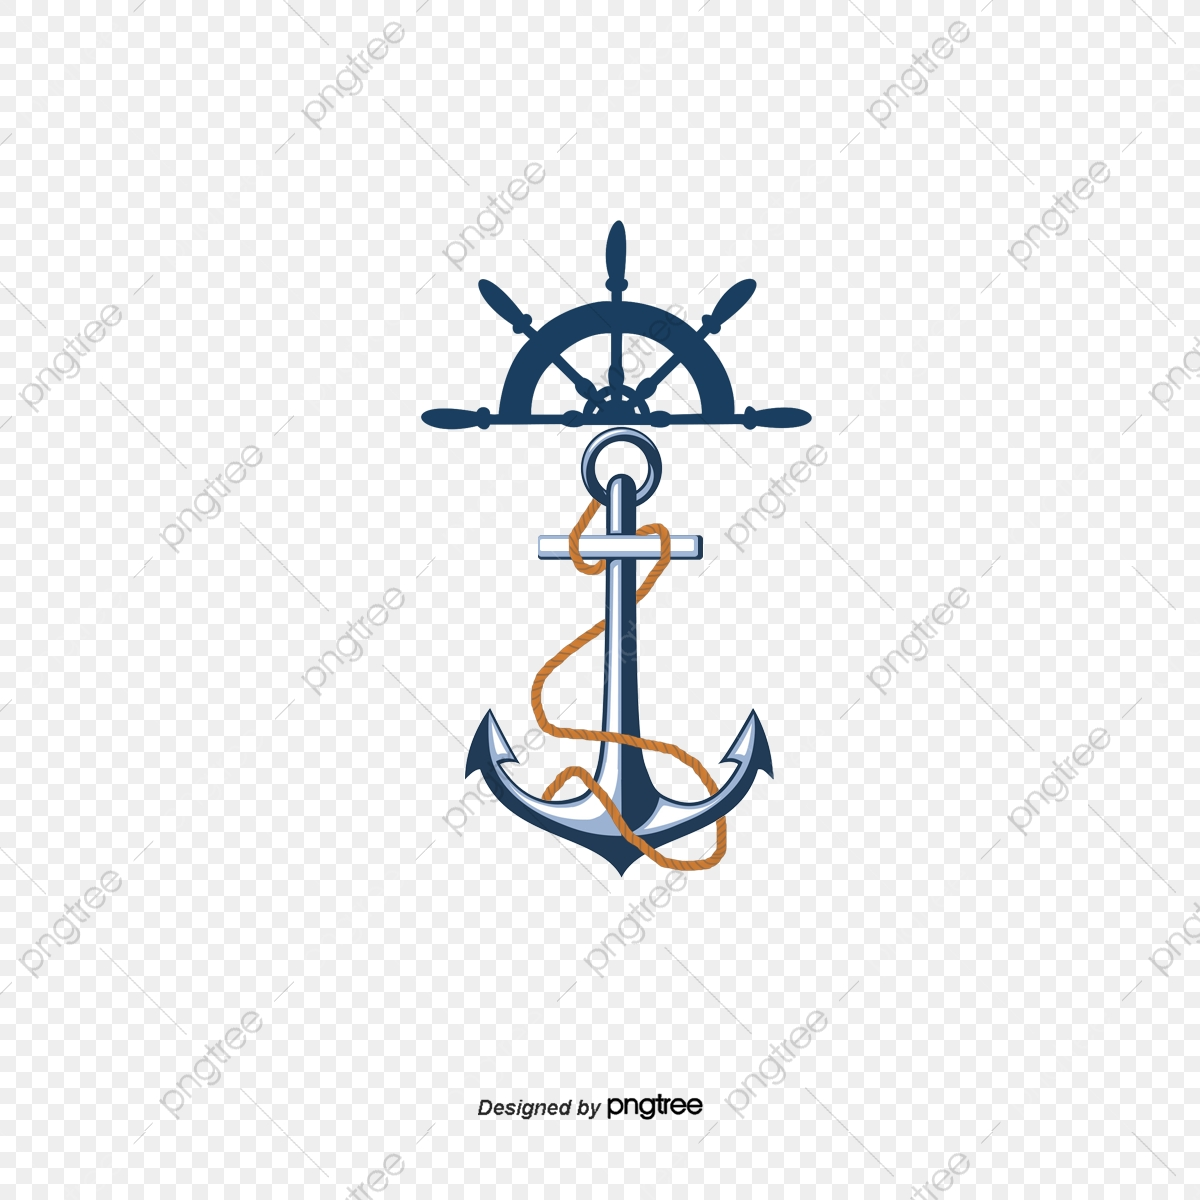 Anchor, Cartoon, Sea, Anchor Clipart PNG Transparent Clipart.